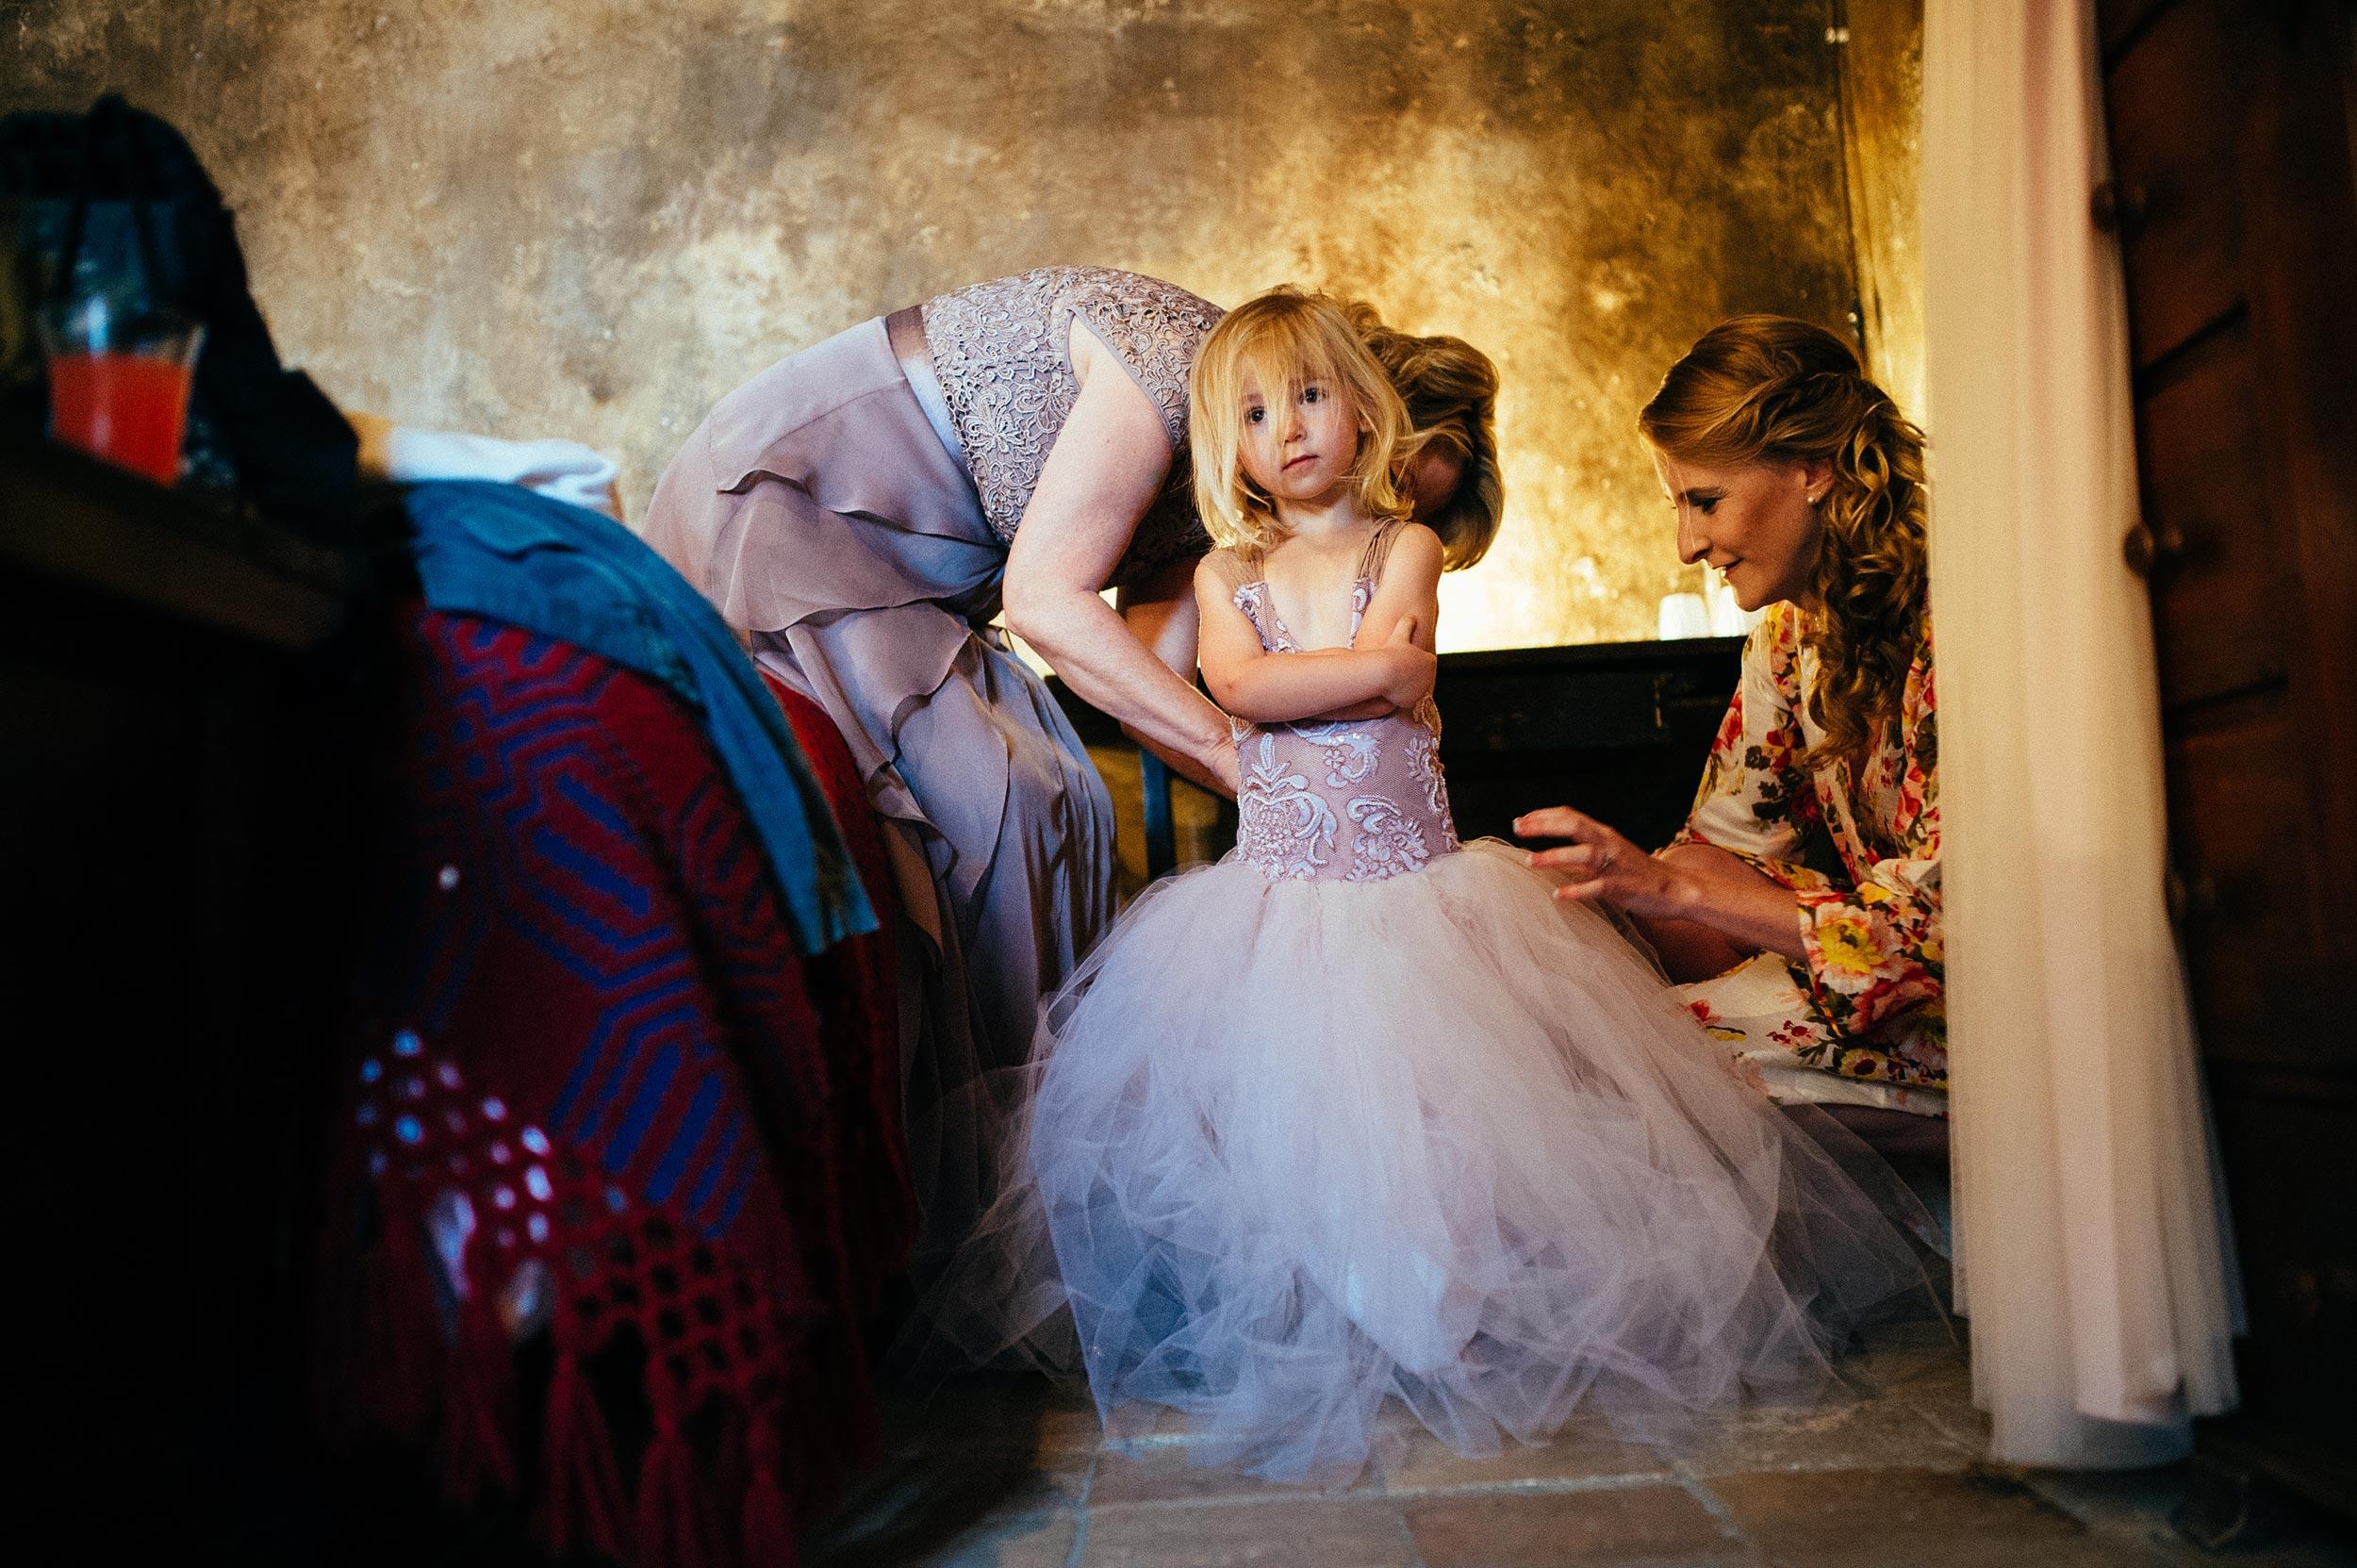 2014-Shelby-Jocelyn-Santo-Stefano-Di-Sessanio-Wedding-Photographer-Italy-Alessandro-Avenali-18.jpg